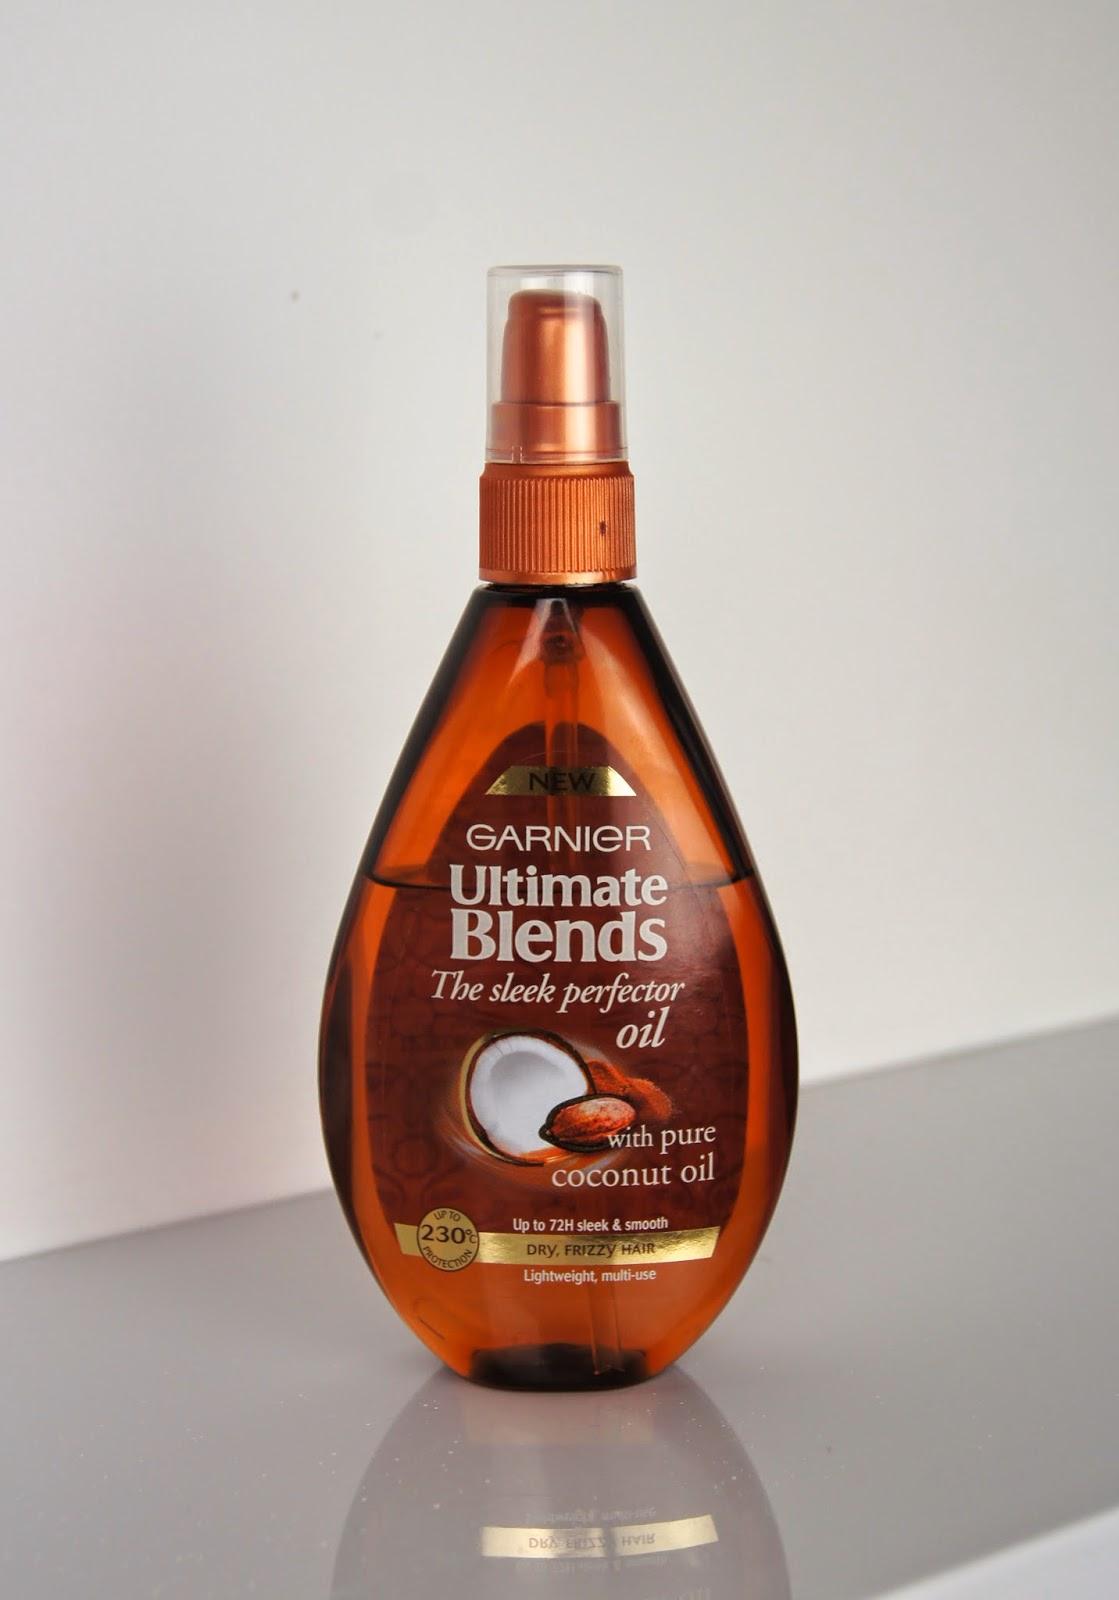 garnier ultimate blends the sleek perfecter hair oil review